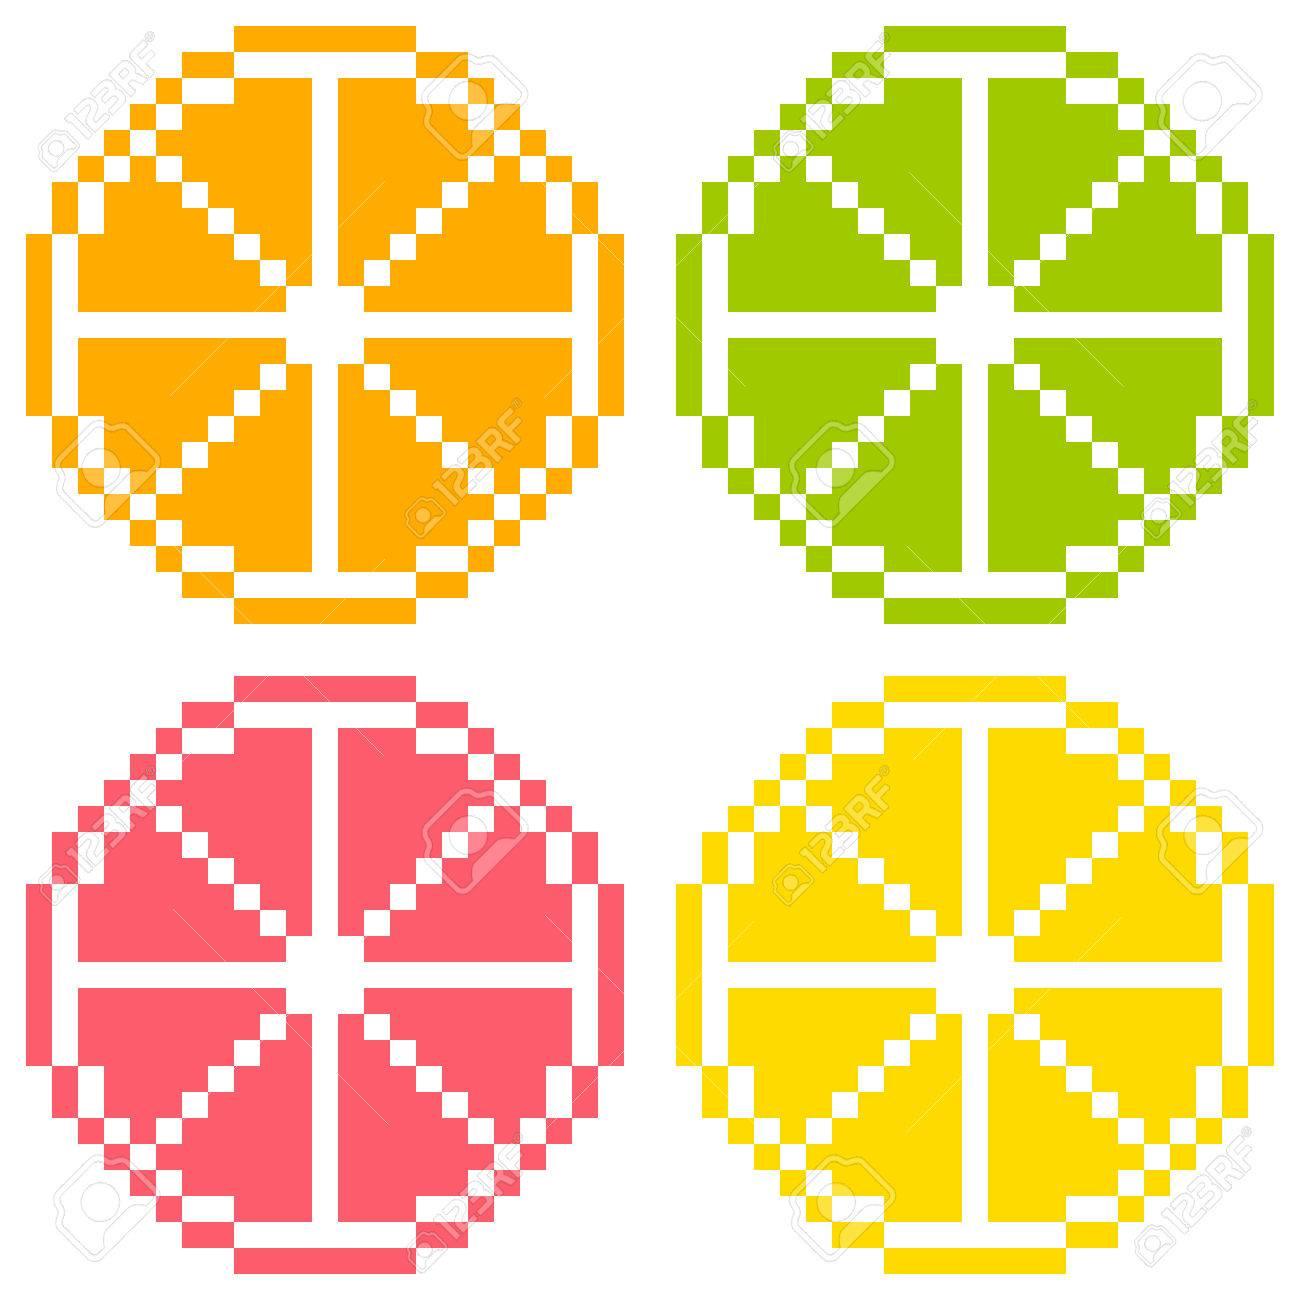 8-bit Pixel Art Citrus Fruit Slices - Orange, Lime, Grapefruit, Lemon  Seamless Background Tile Stock Vector - 24912400